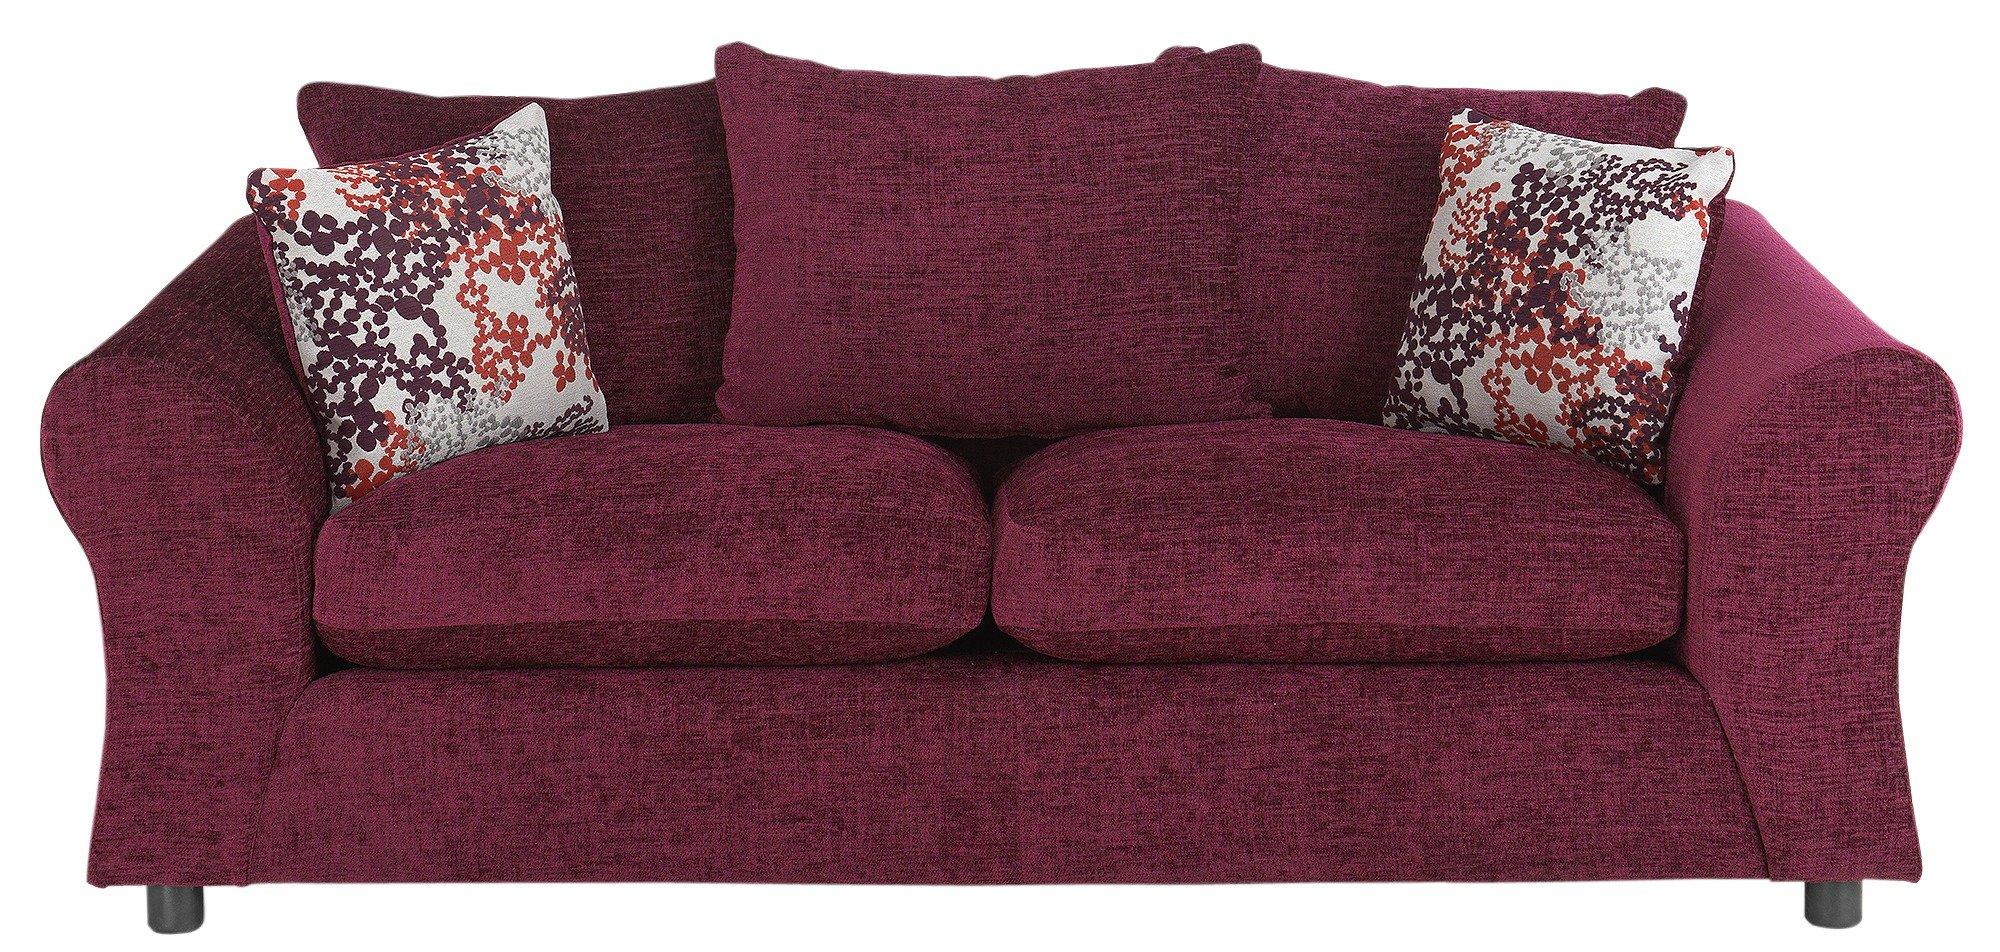 argos brooklyn sofa large two seater length lauren plum chenille